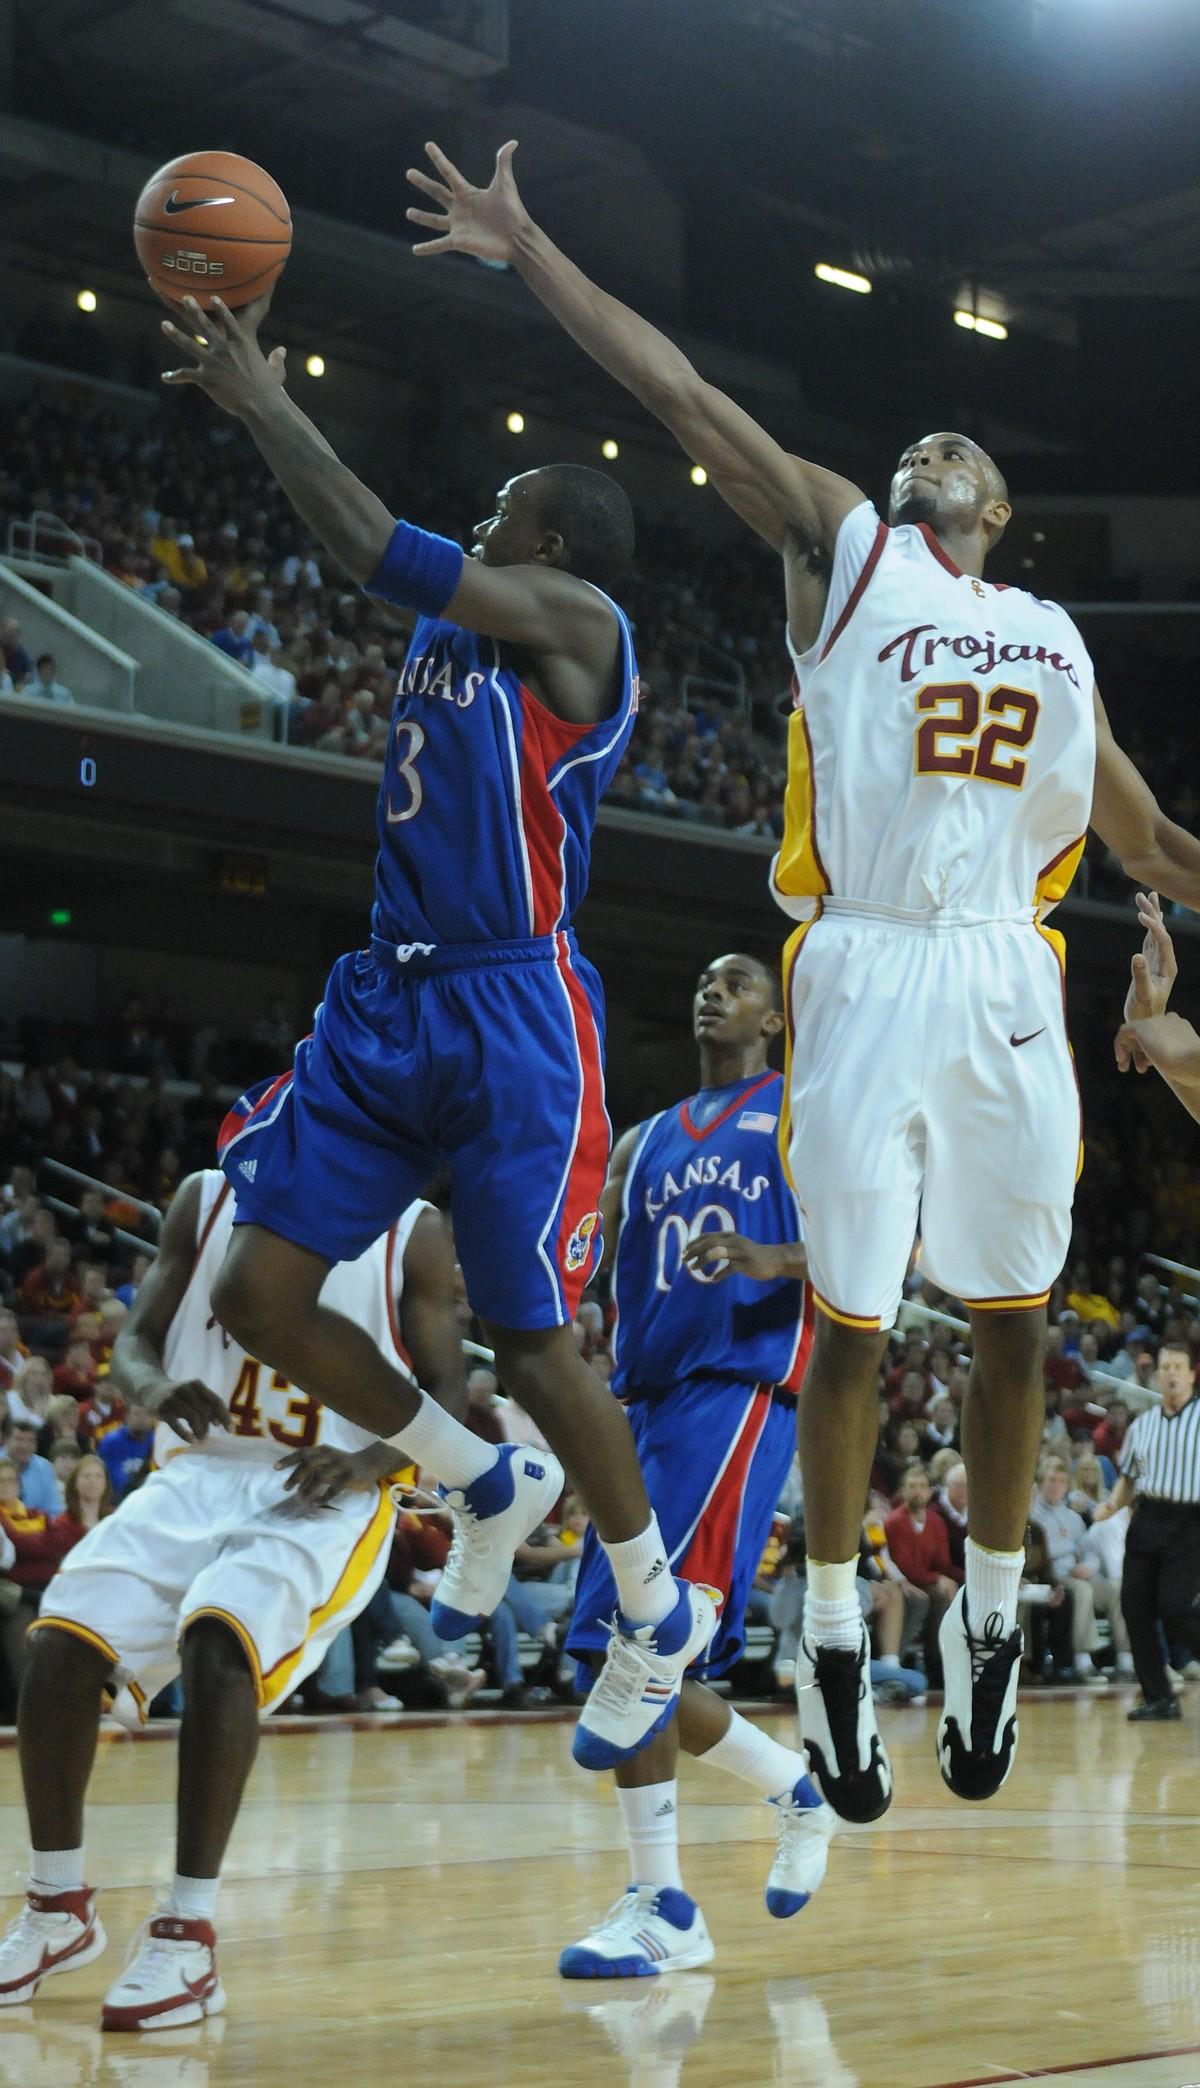 Usc basketball uniforms